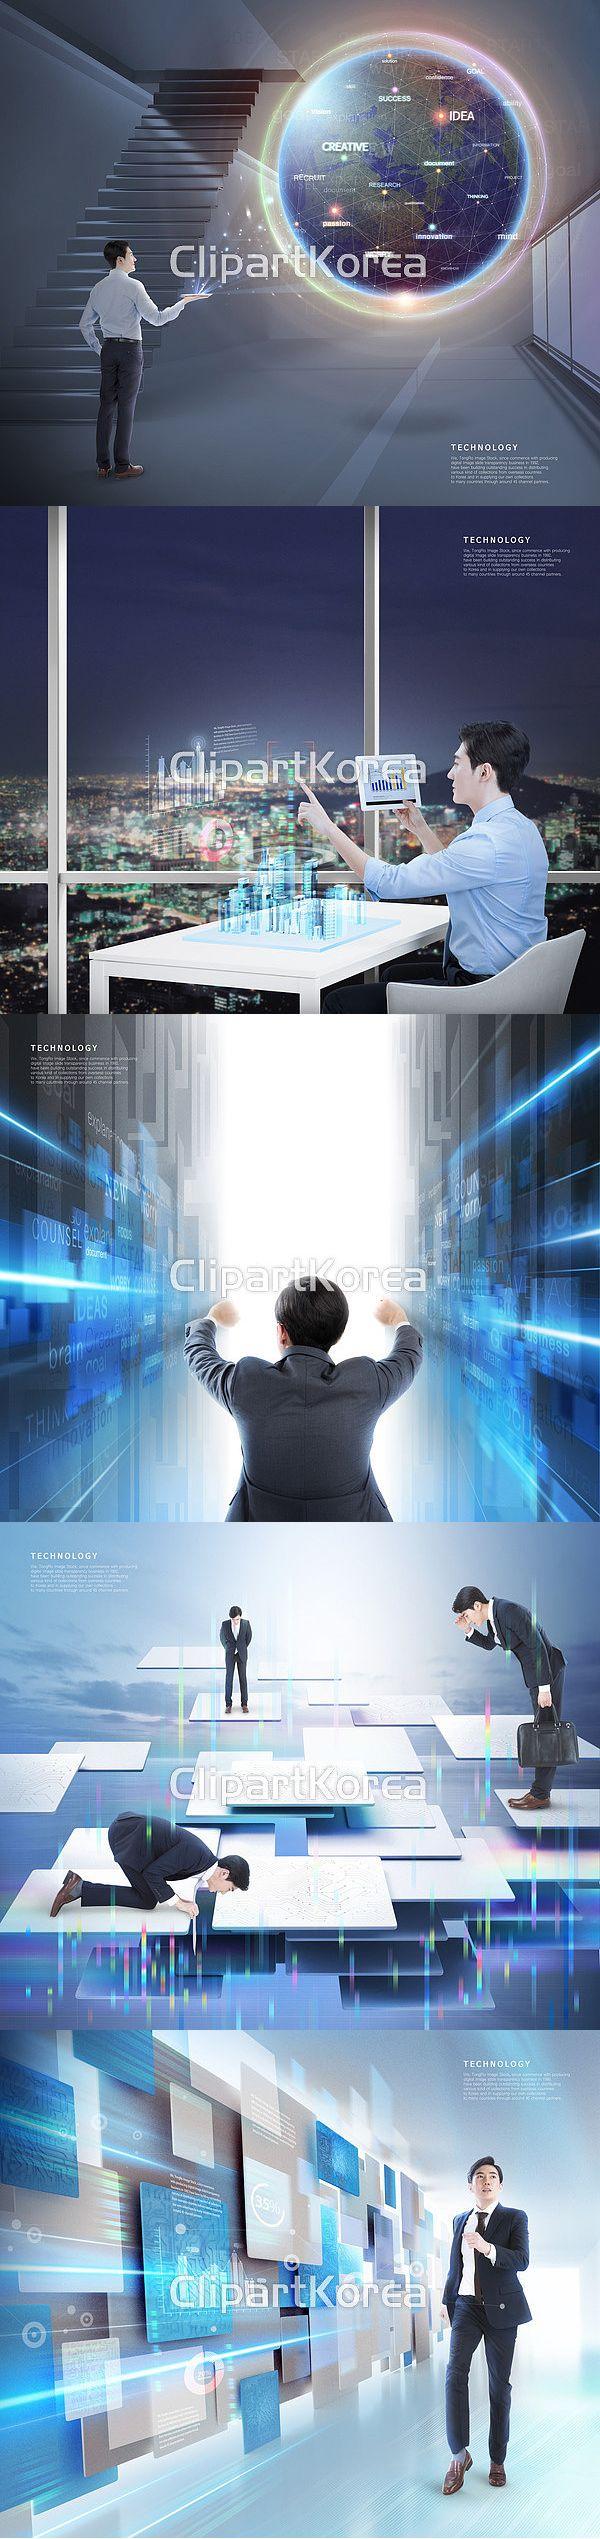 3D IT 가상현실 계단 디지털 메쉬 미래 반짝임 비전 비즈니스 산업 성공 자신감 전략 전신 정장 지도 창문 컨셉 태블릿 하이테크 합성이미지 혁신  도전 서류가방 이펙트 호기심 도시 그래프 야경 창문 클릭 태블릿 터치 테이블 하이테크 모니터 빛 Virtual Reality Stairs Digital Mesh Future Glitter Vision Business Industry Success Confidence Strategy Suit Map Window Concept Tablet Composite image Innovation Challenge Briefcase Effect Curiosity City Graph Night view Window Click Tablet Touch Table Hi-tech Monitors Light 클립아트코리아 이미지투데이 통로이미지 clipartkorea imagetoday tongroimages